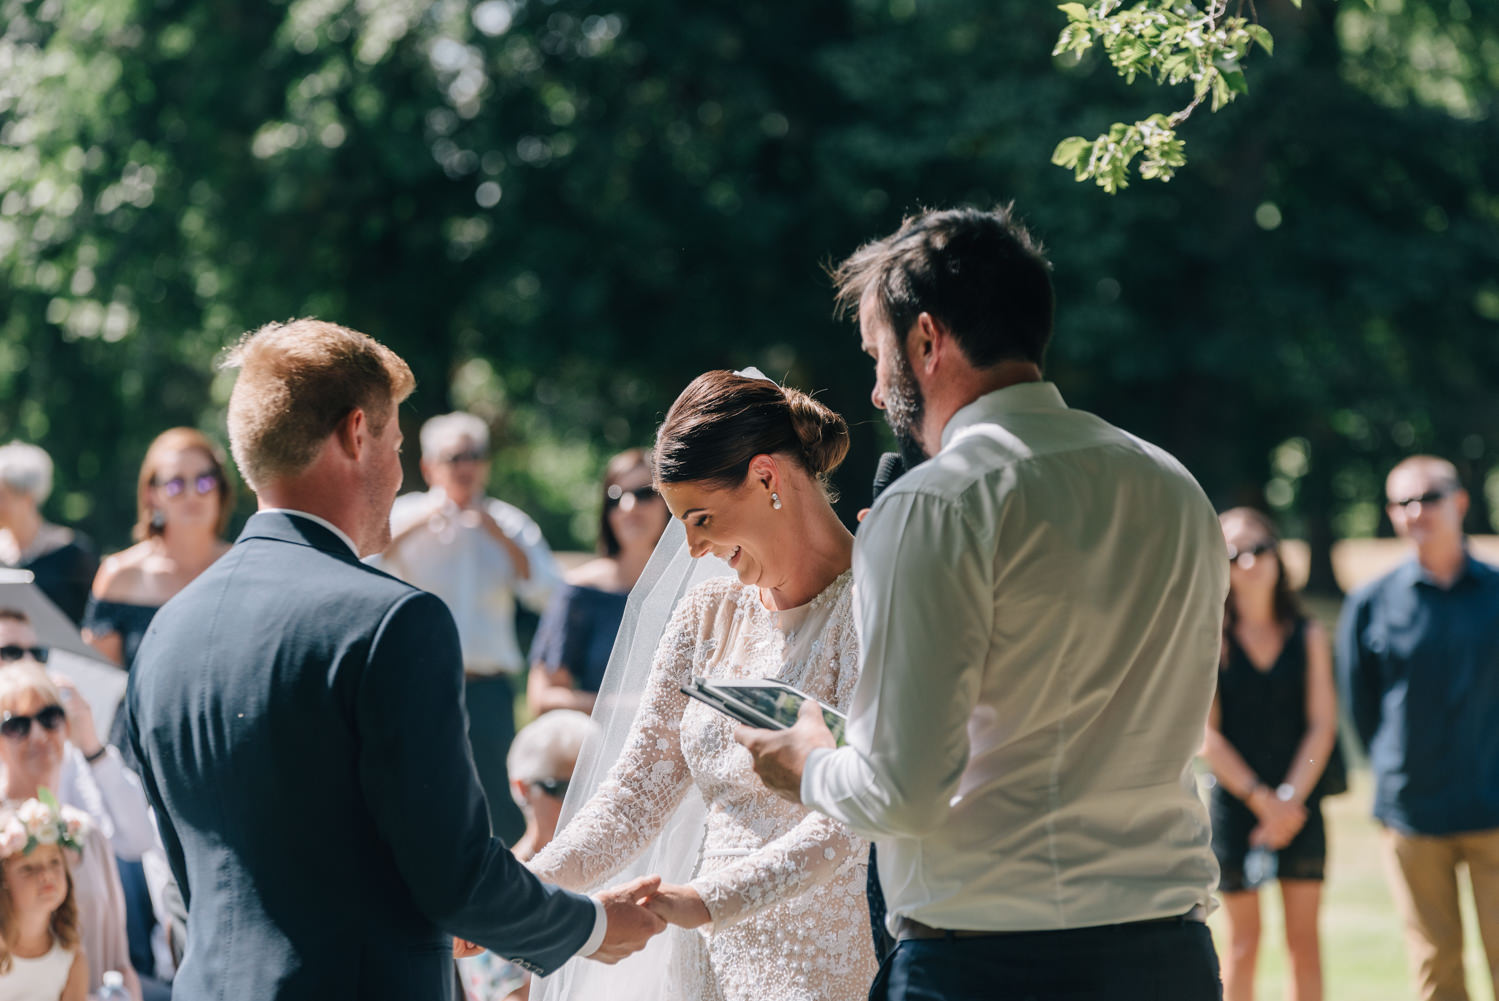 Quamby-Wedding-Photography-59.jpg